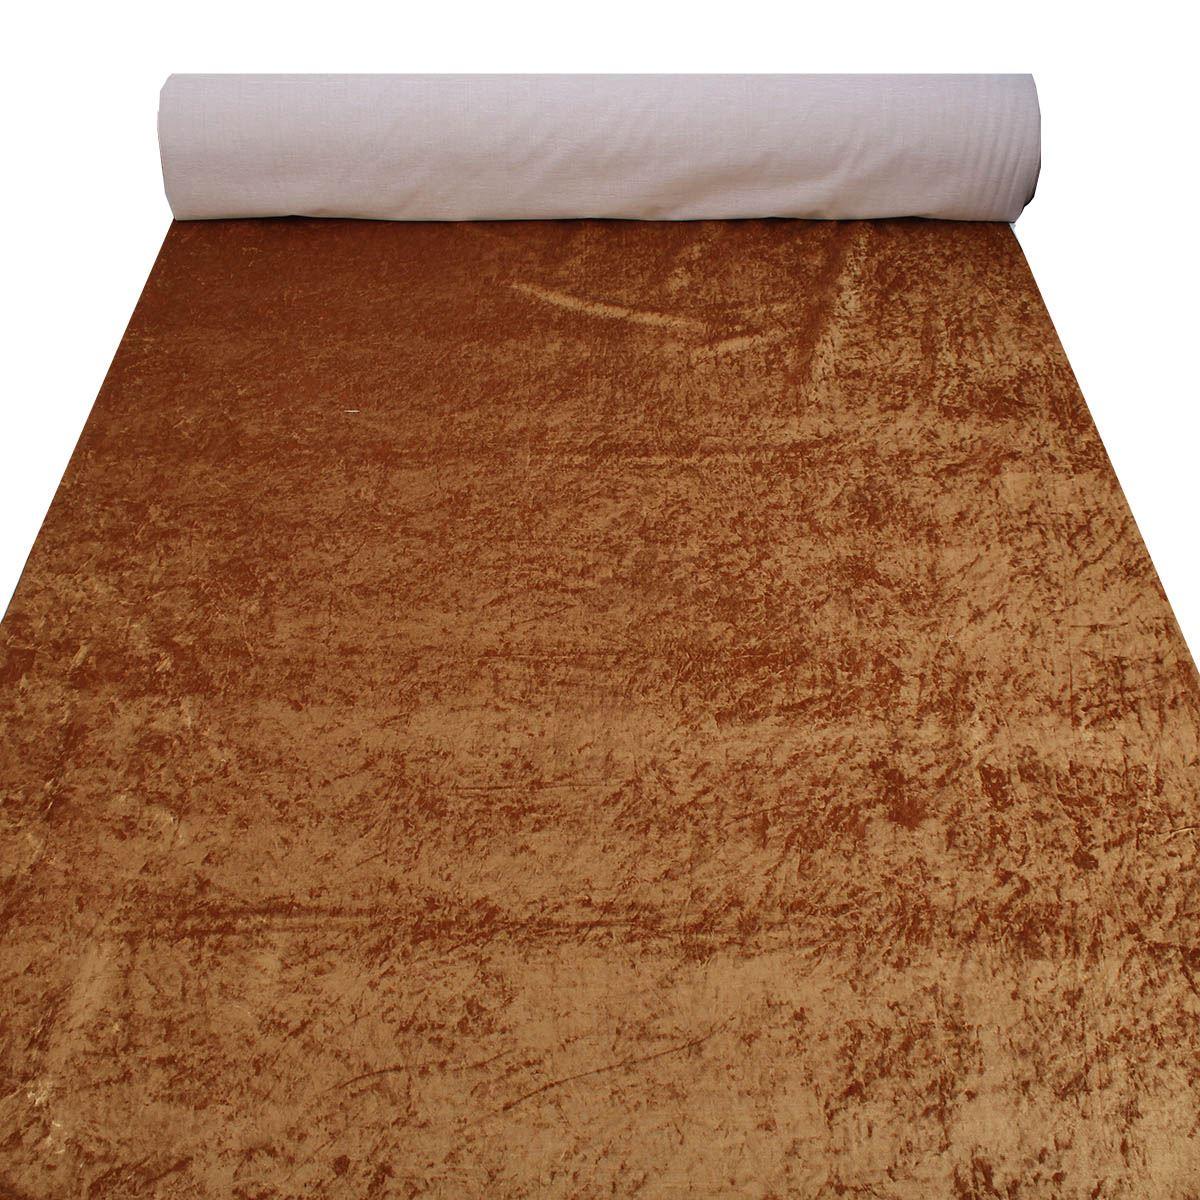 thumbnail 25 - Marble Velour Crushed Velvet Plush Soft Furnishing Curtain Cushion Fabric